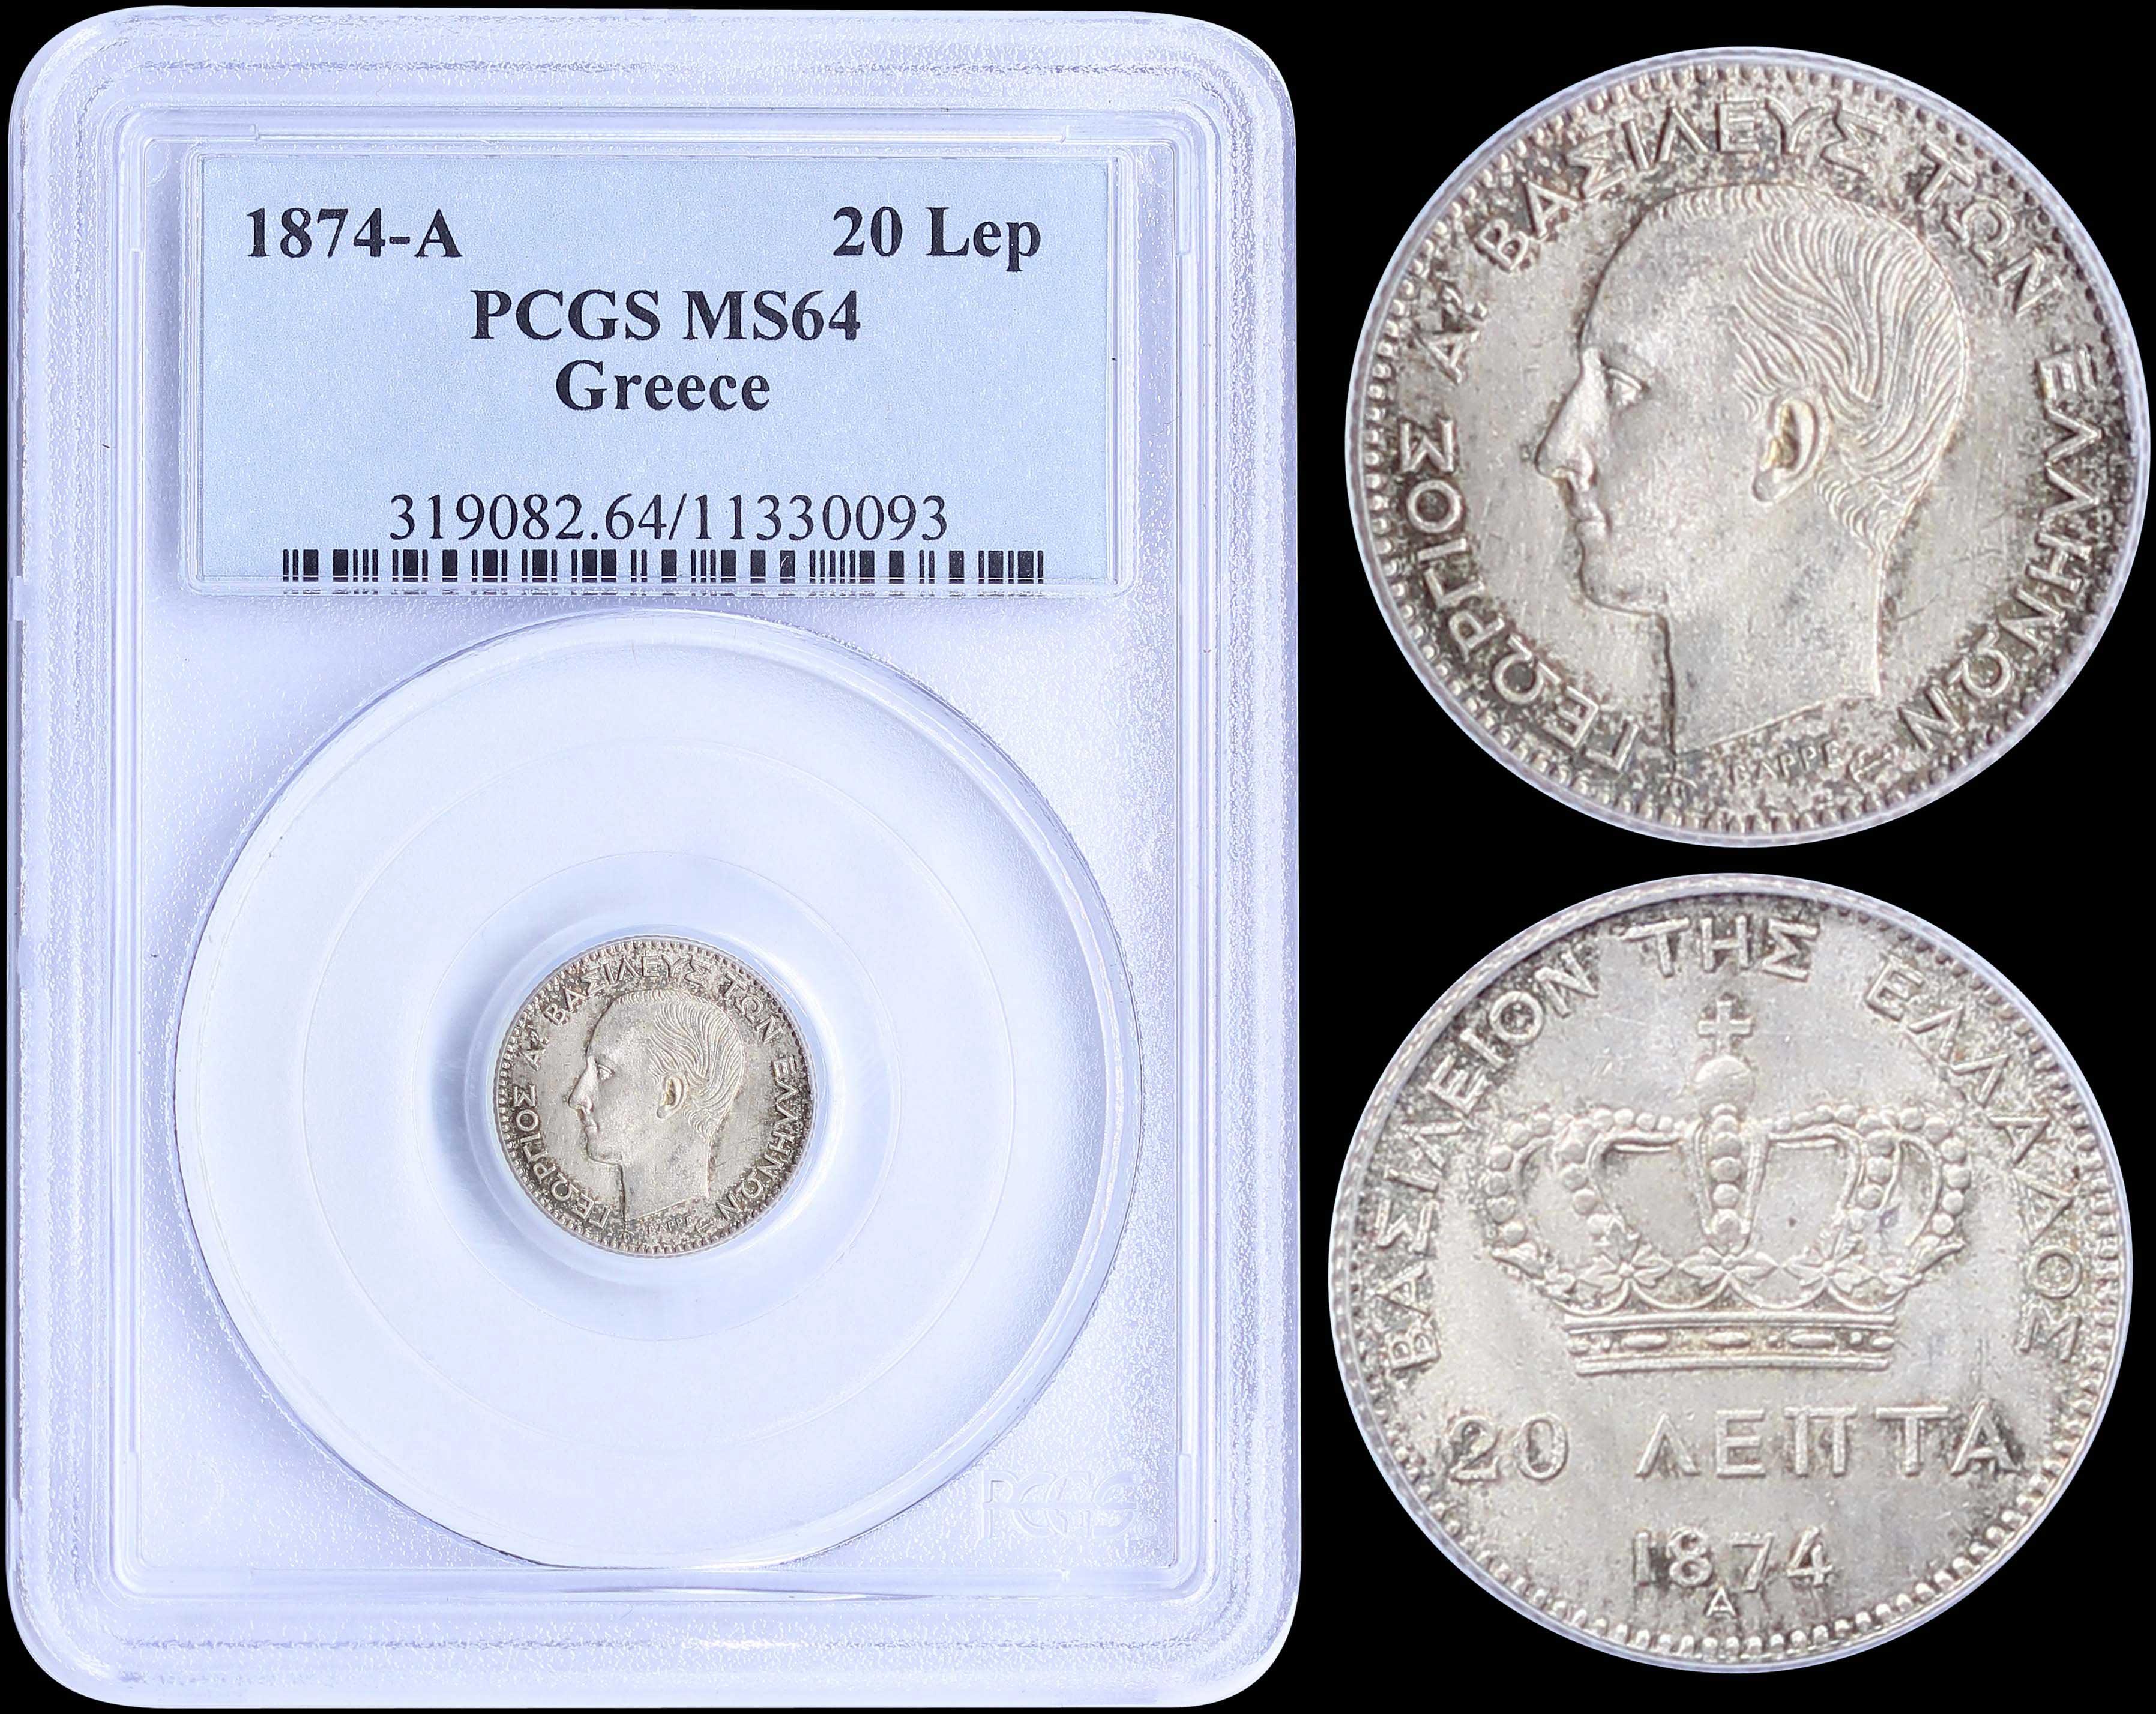 Lot 8125 - -  COINS & TOKENS king george i -  A. Karamitsos Public & Live Bid Auction 644 Coins, Medals & Banknotes